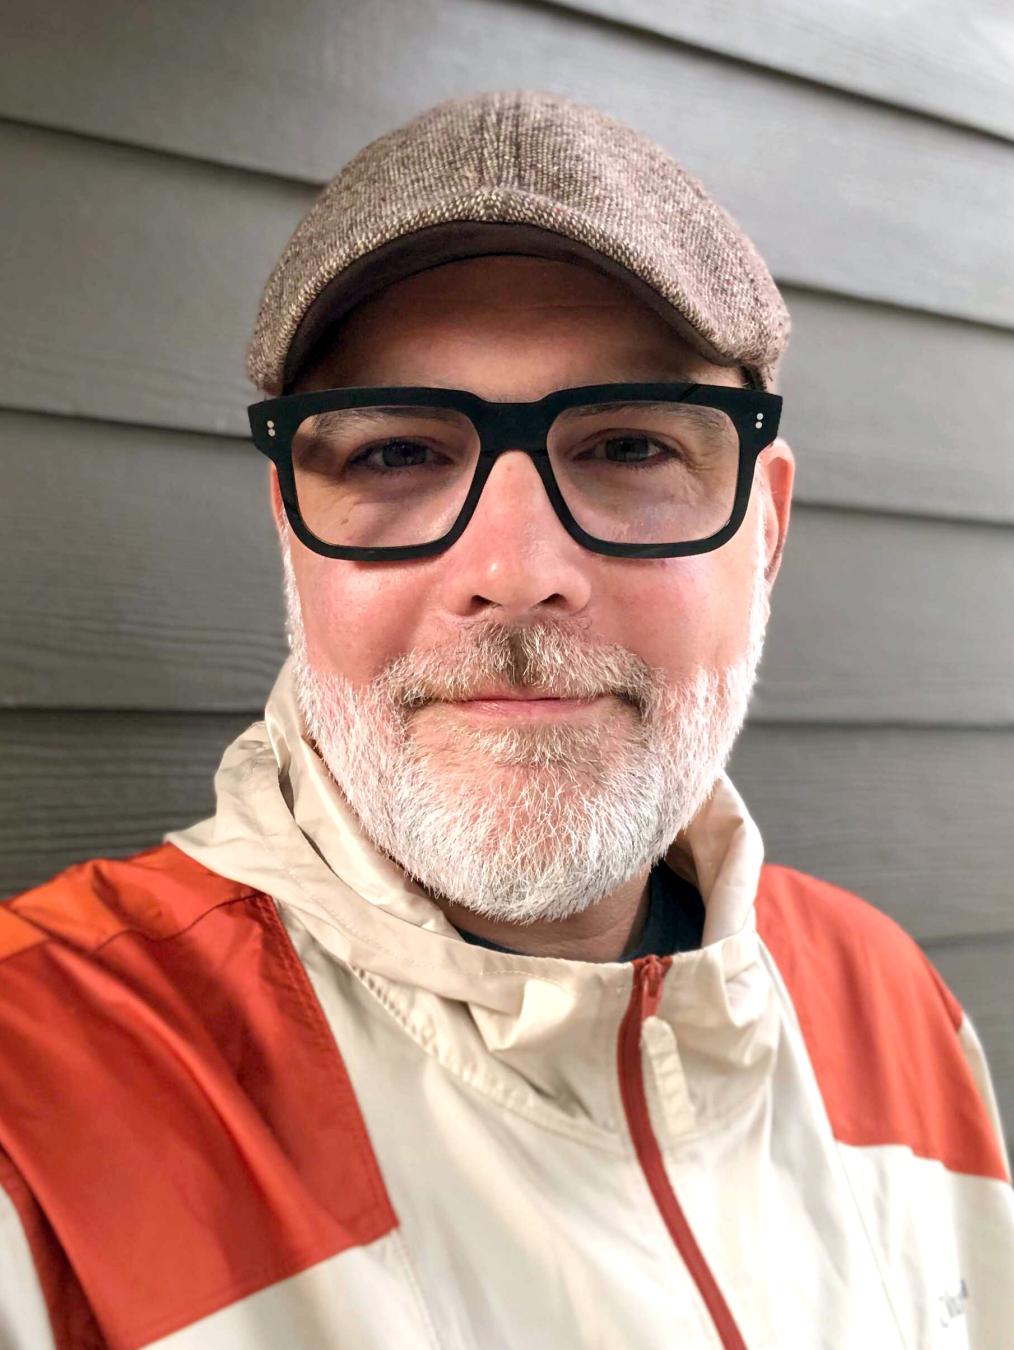 Jason Huff - Design Lead, Operations